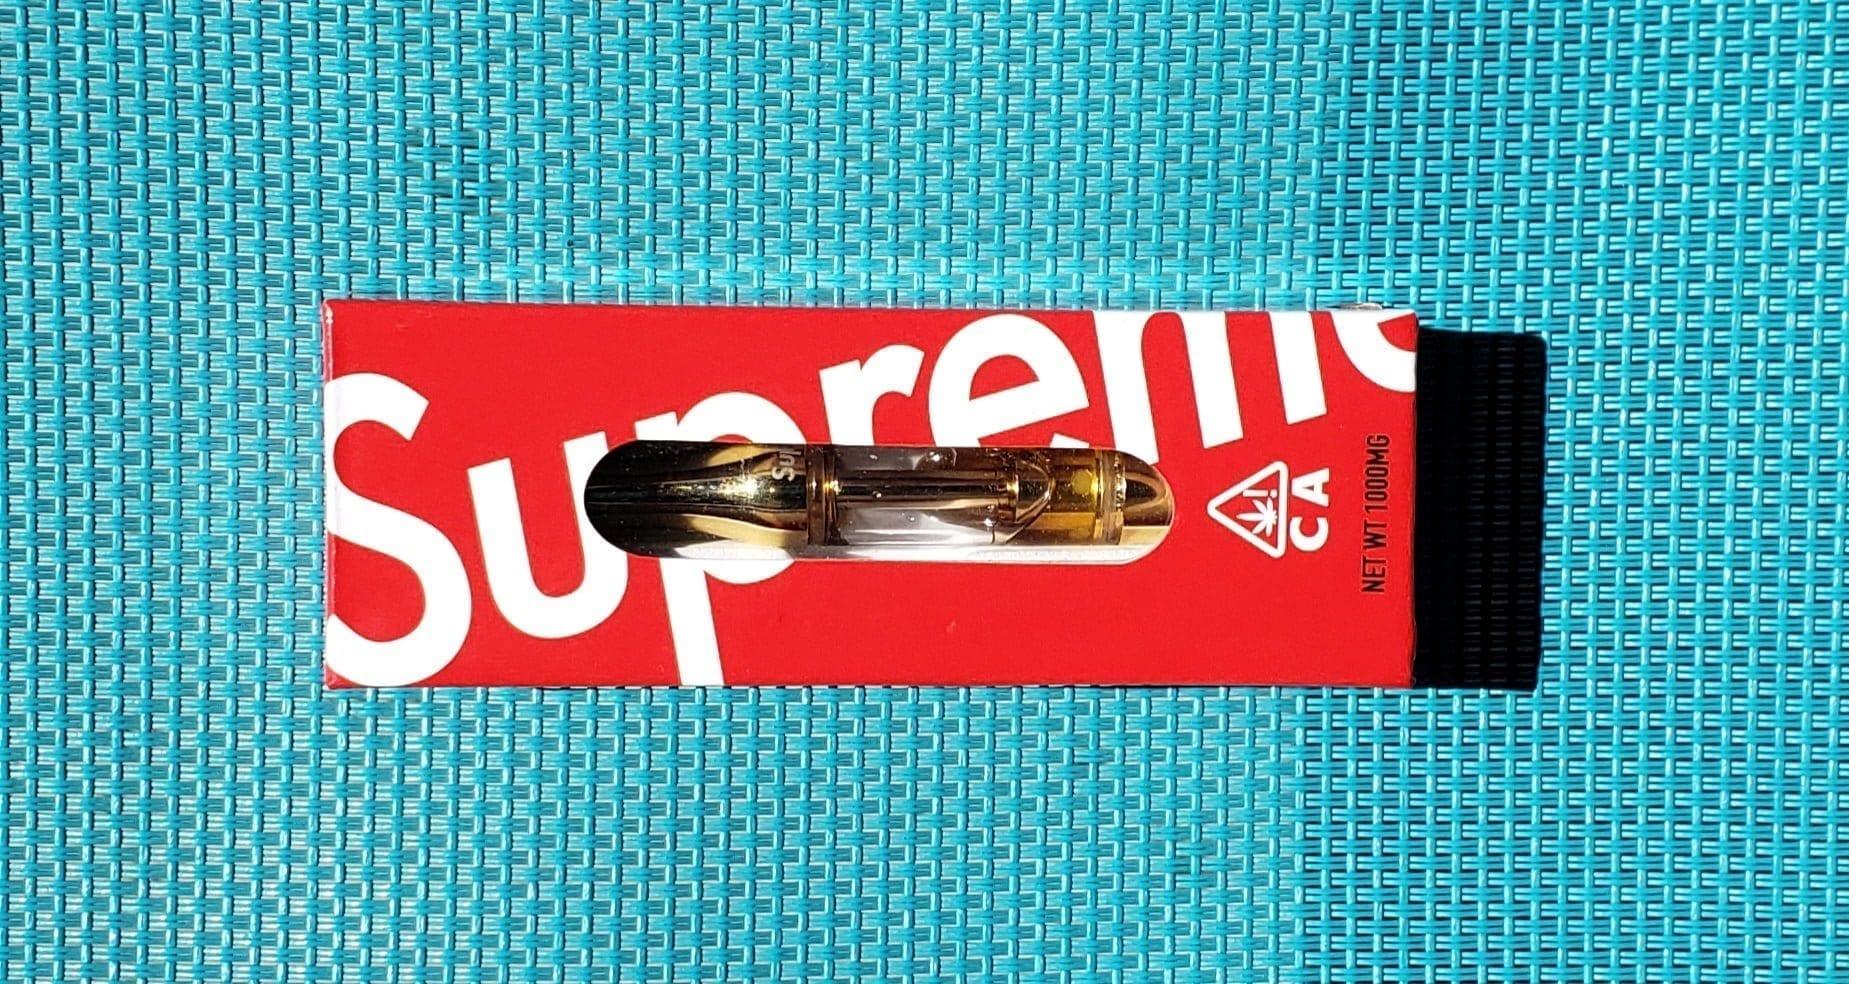 Supreme Vape Cartridge Review: 1 Gram of Liquid Mystery